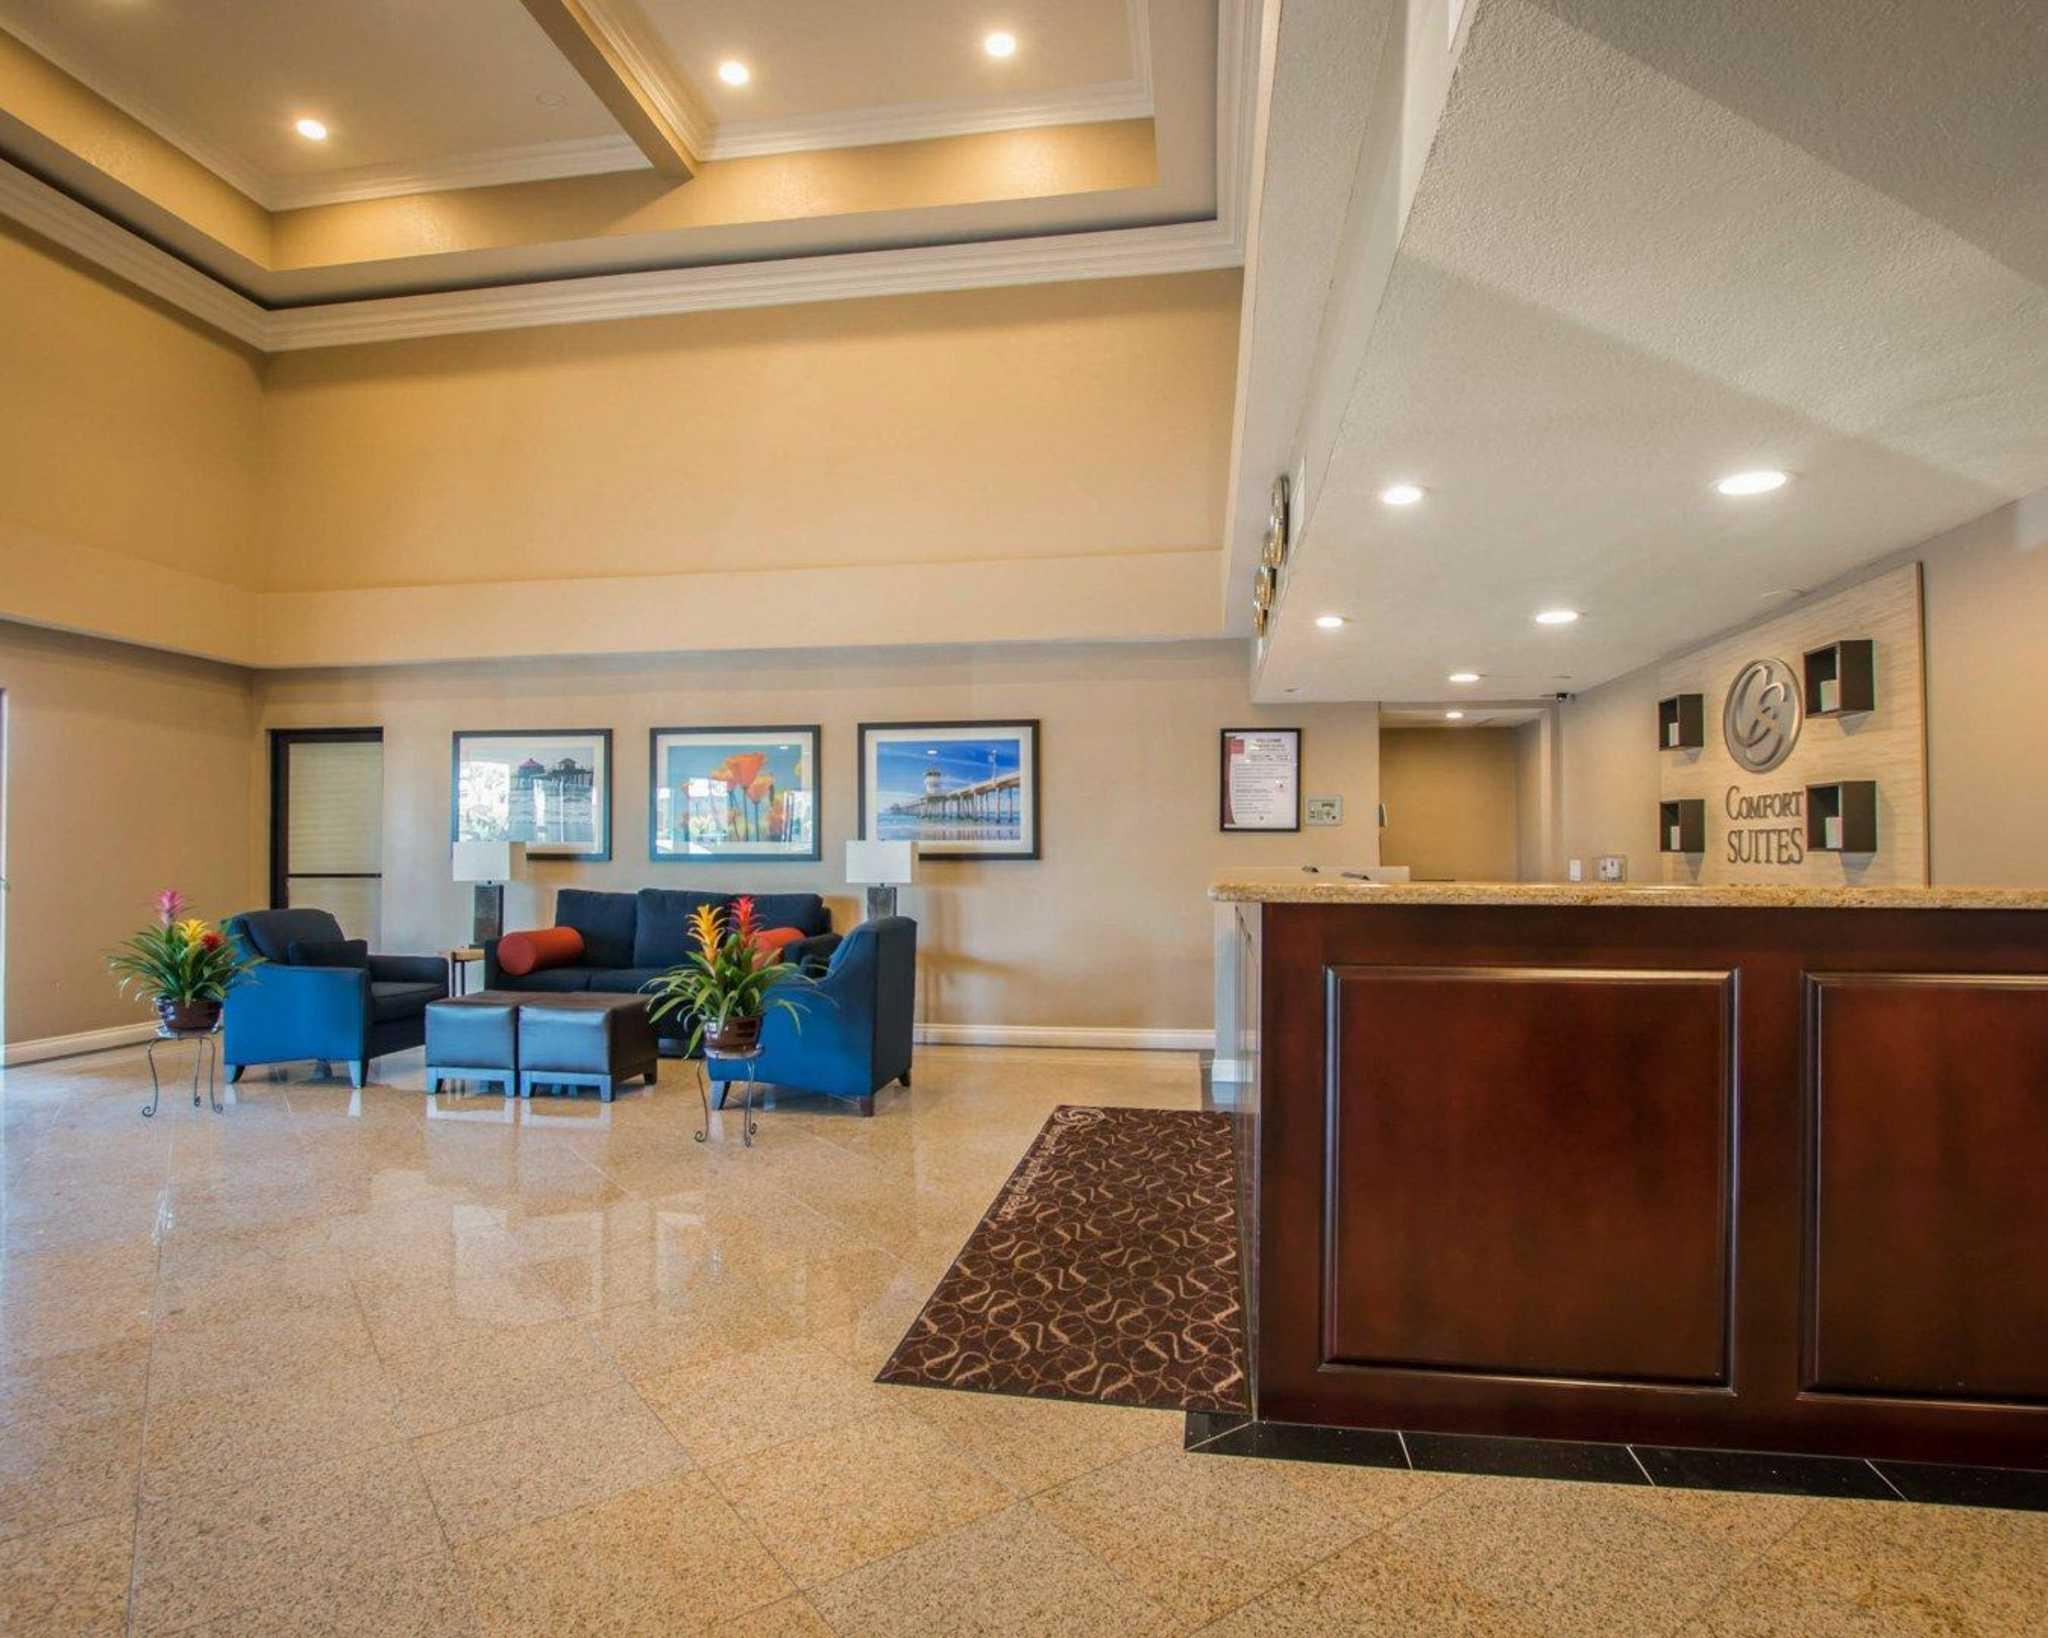 Comfort Suites Huntington Beach image 11